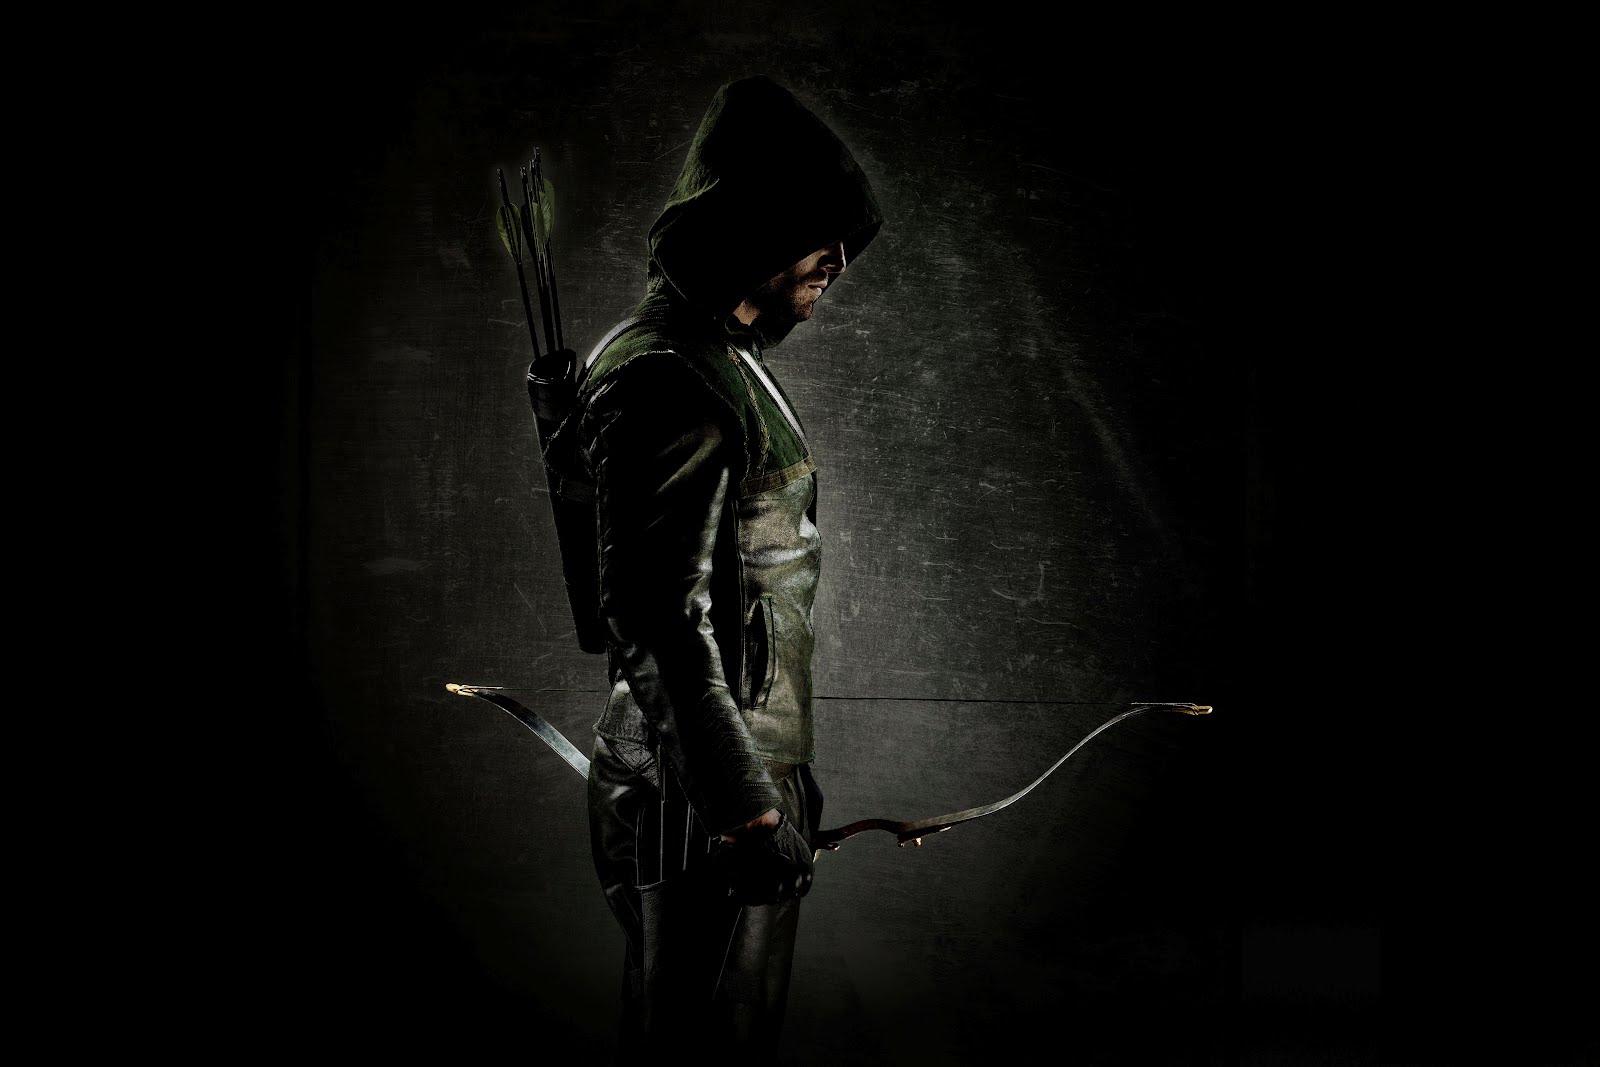 http://2.bp.blogspot.com/-ELVNIsQrKP0/T2icyFa3biI/AAAAAAAAQk8/wUPU7NYY_rU/s1600/green-arrow-stephen-amell-image.jpg